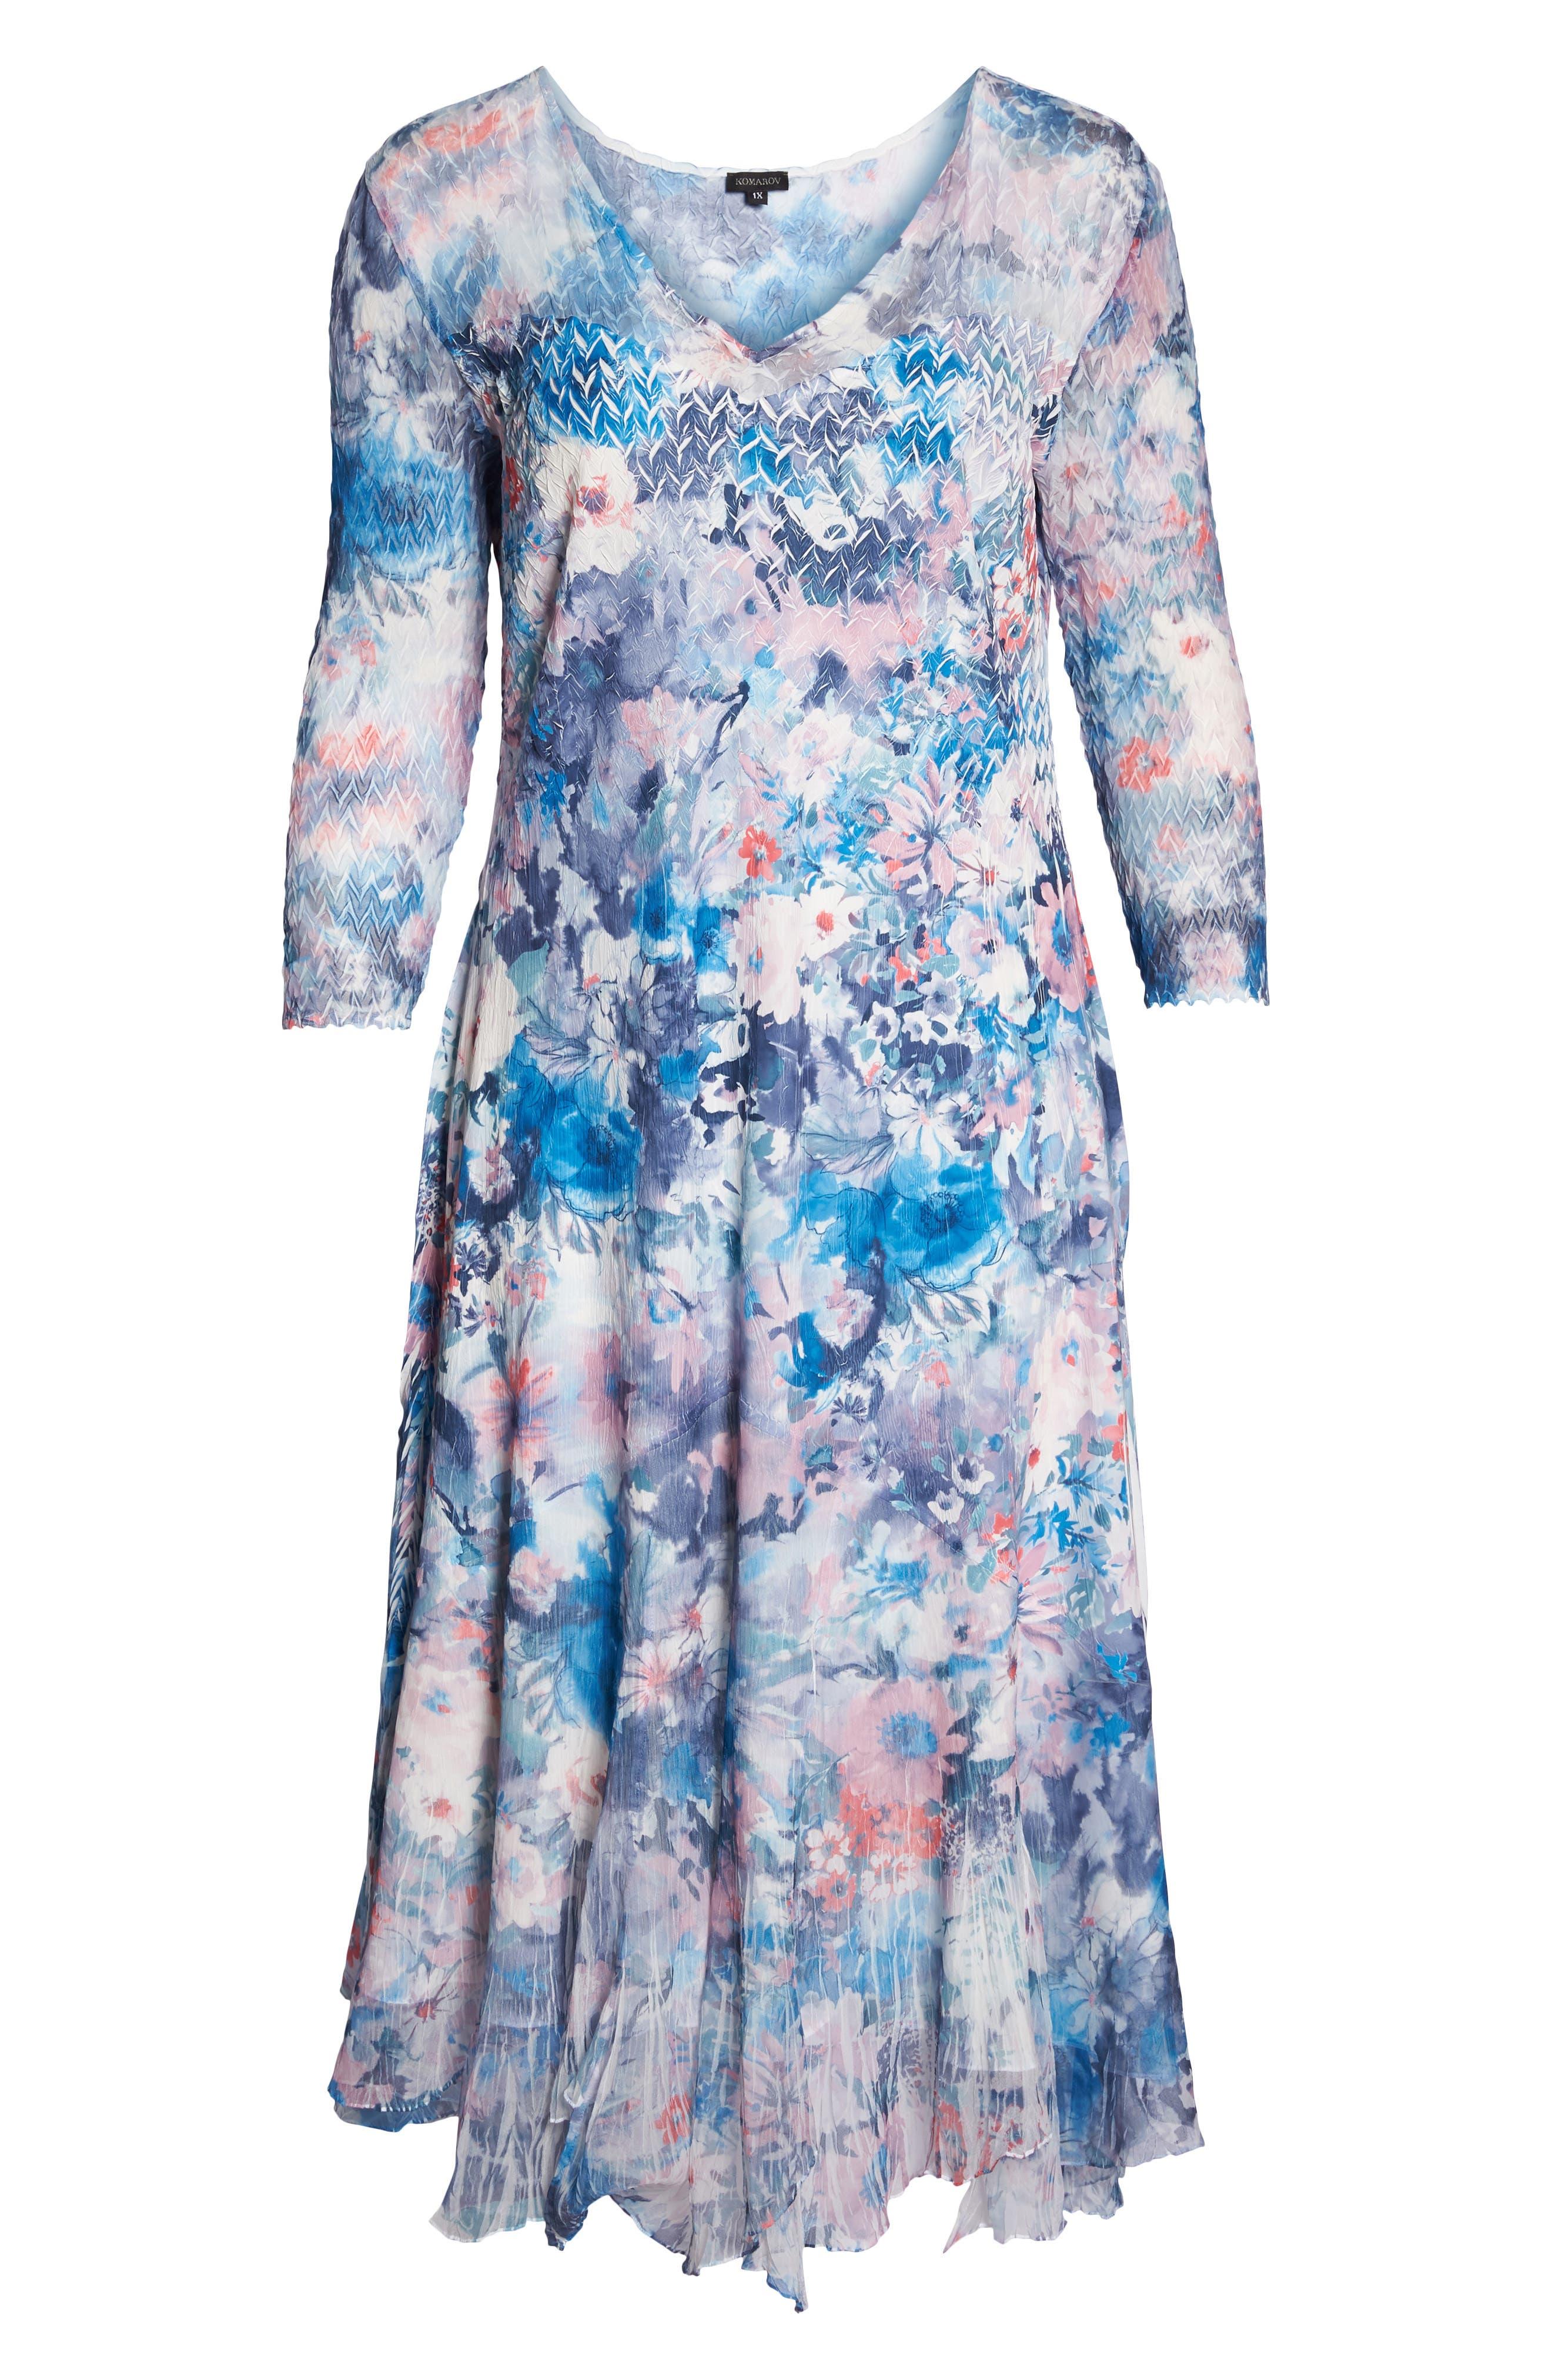 Inset Floral Charmeuse & Chiffon A-Line Dress,                             Alternate thumbnail 7, color,                             405